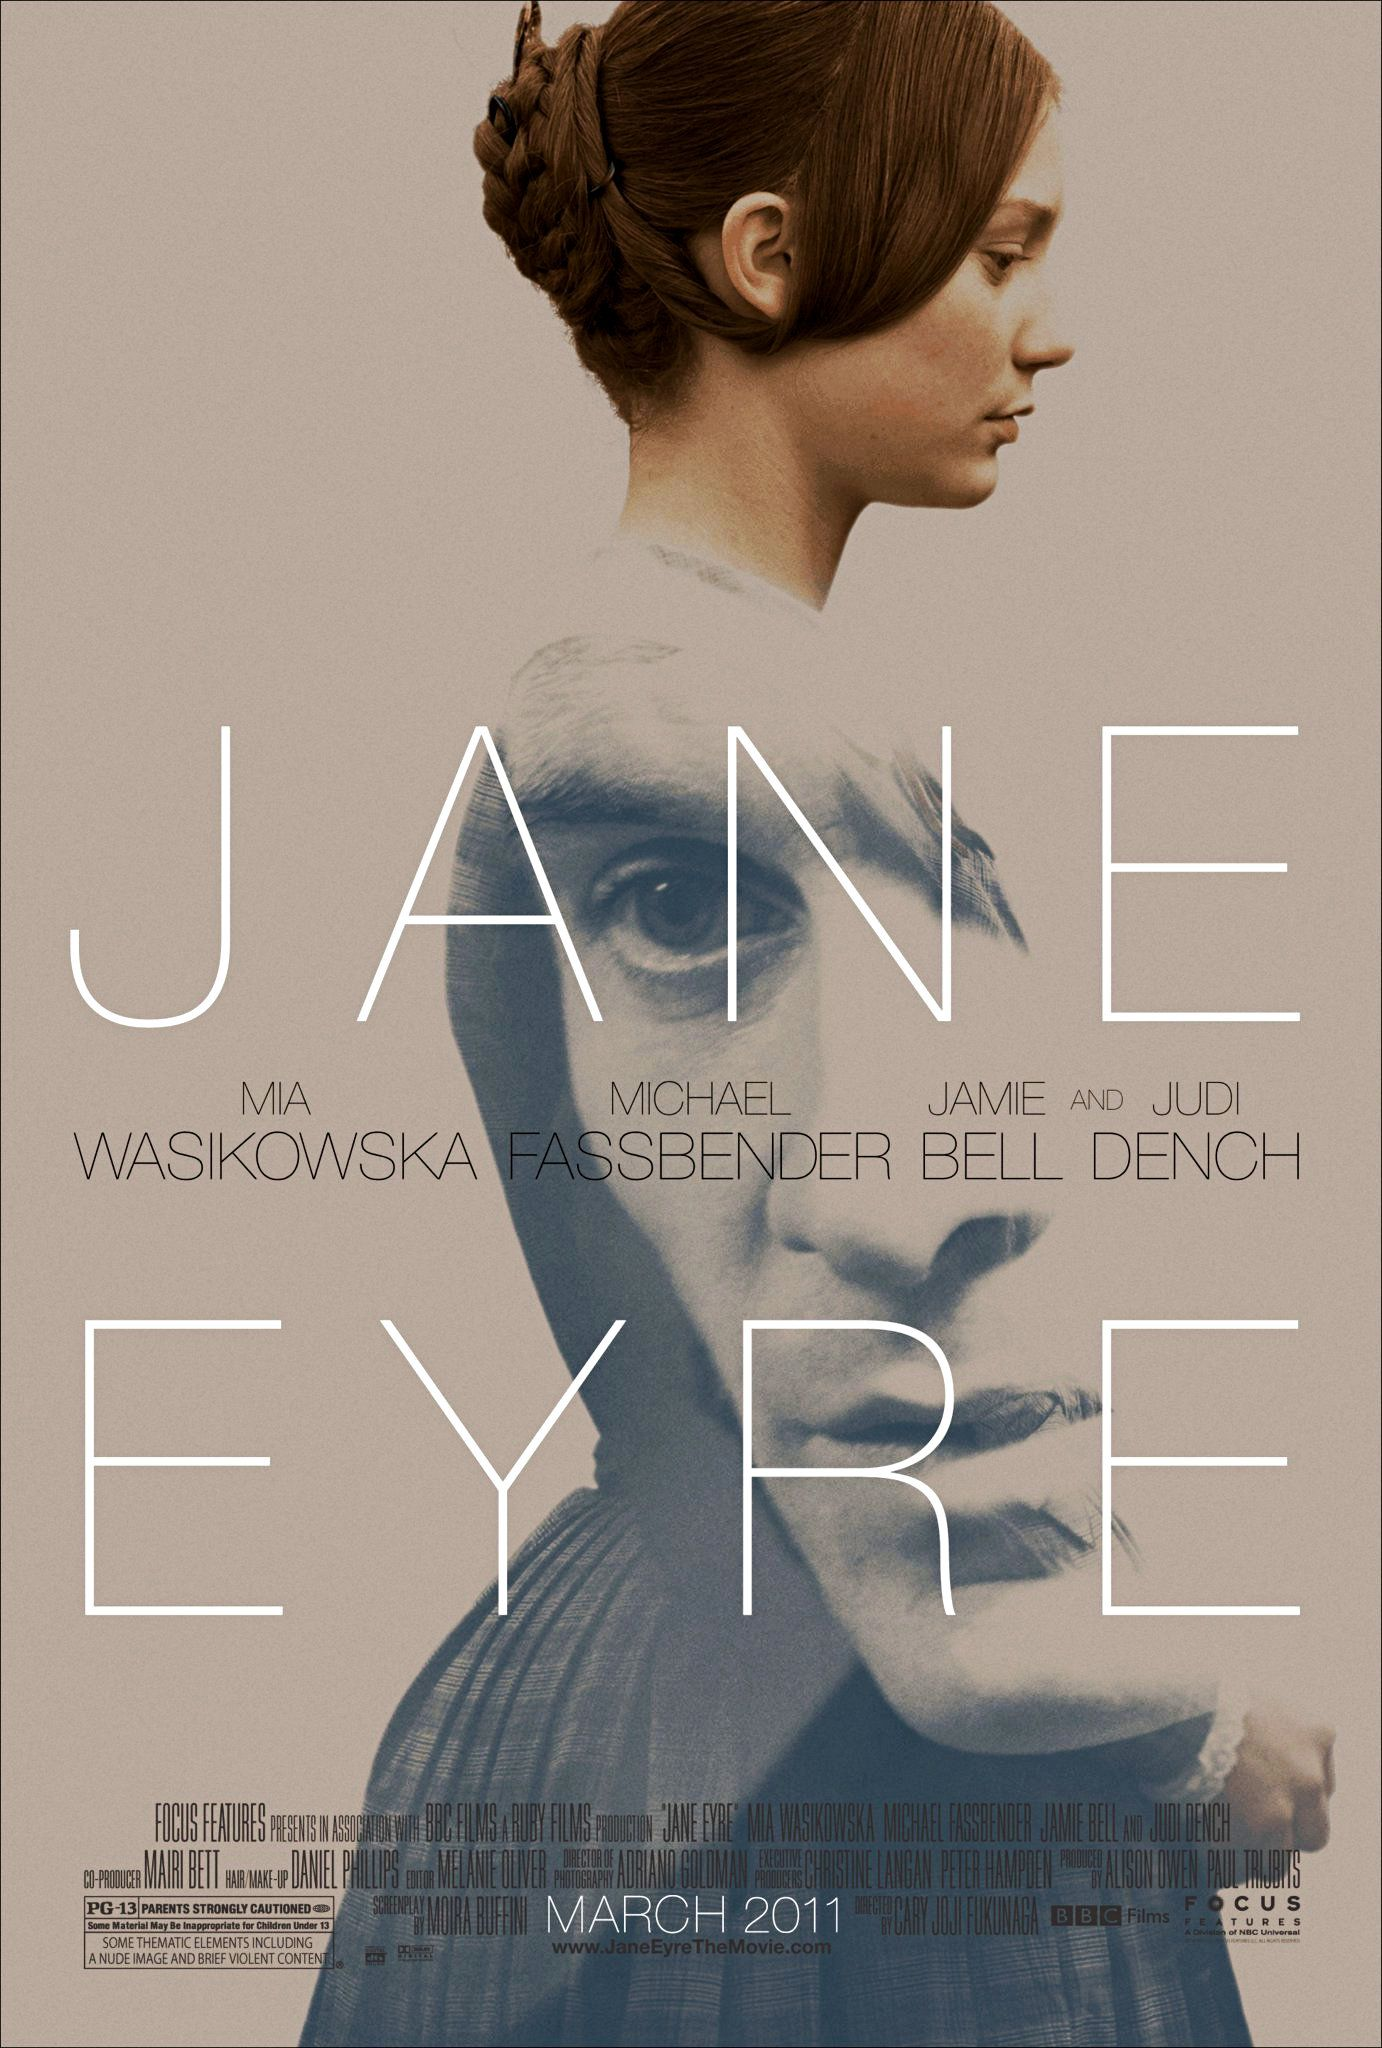 Jane Eyre Poster01 Jpg Jpeg Image 1382x2048 Pixels Jane Eyre Movie Jane Eyre Jane Eyre 2011